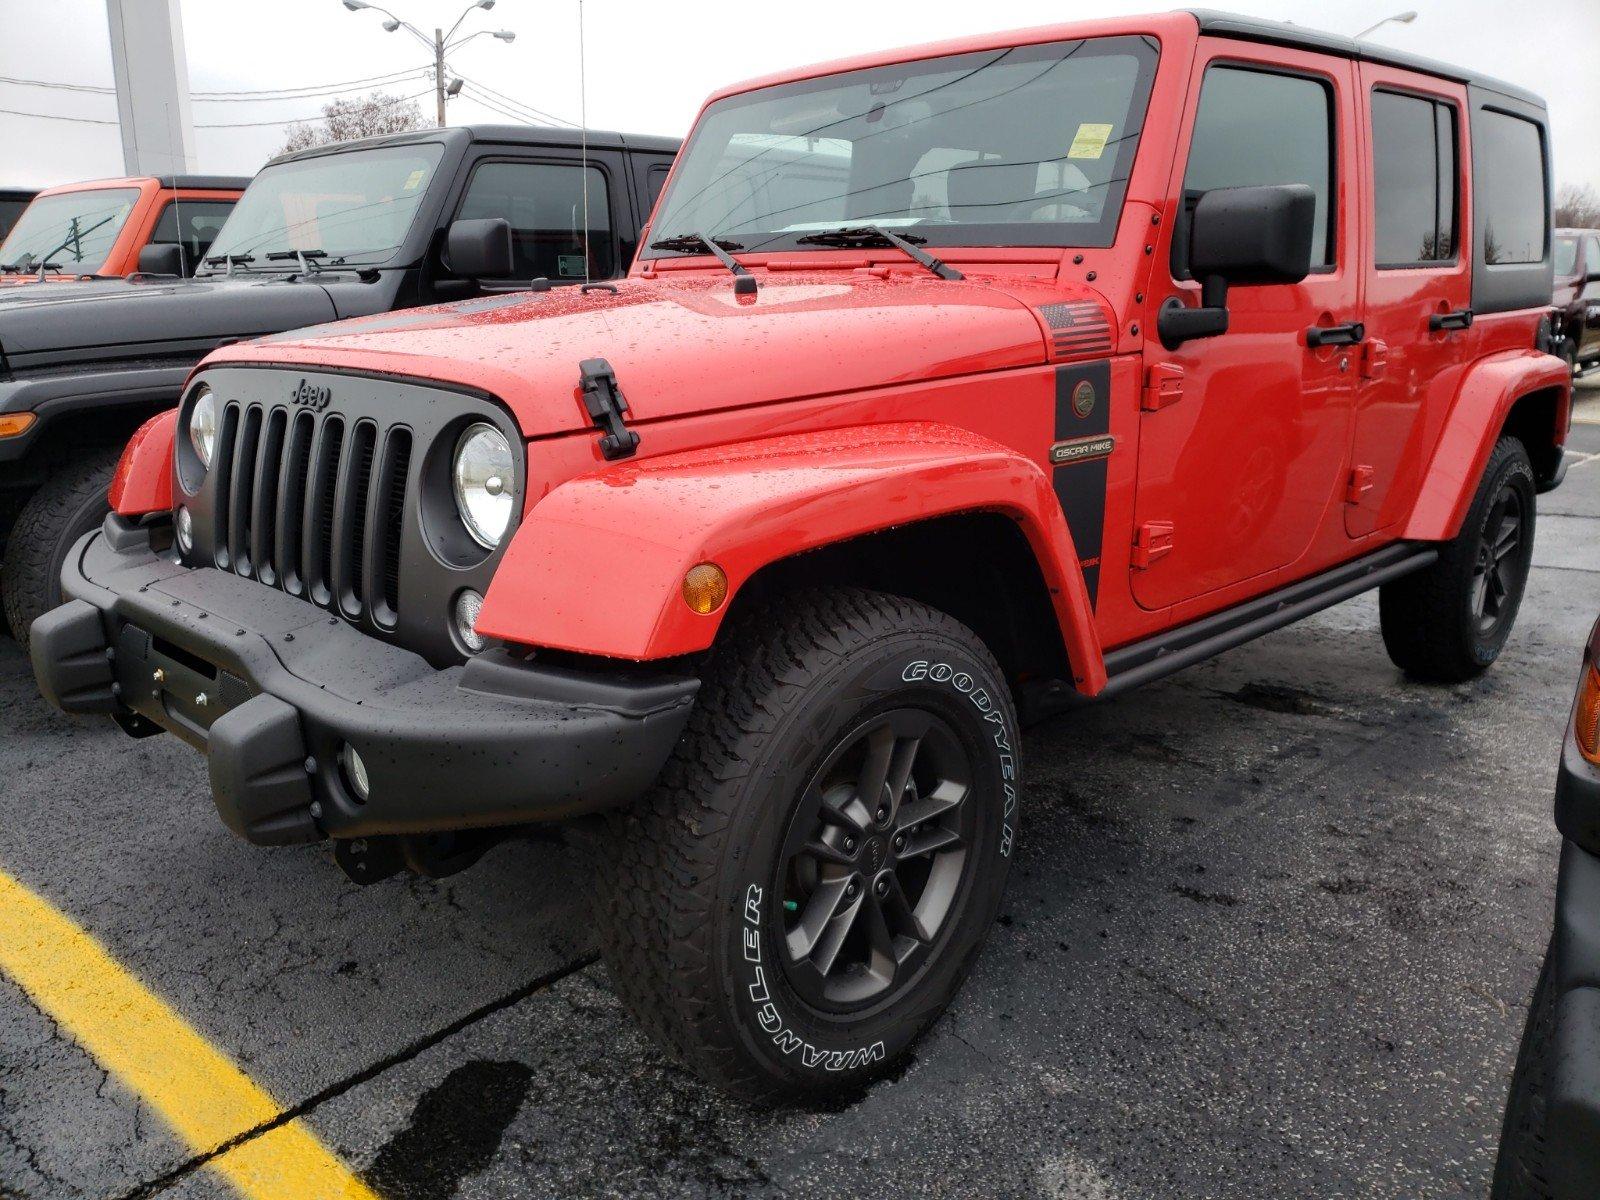 2018 Jeep Wrangler Unlimited WRANGLER JK UNLIMITED FREEDOM EDITION 4X4 Sport Utility